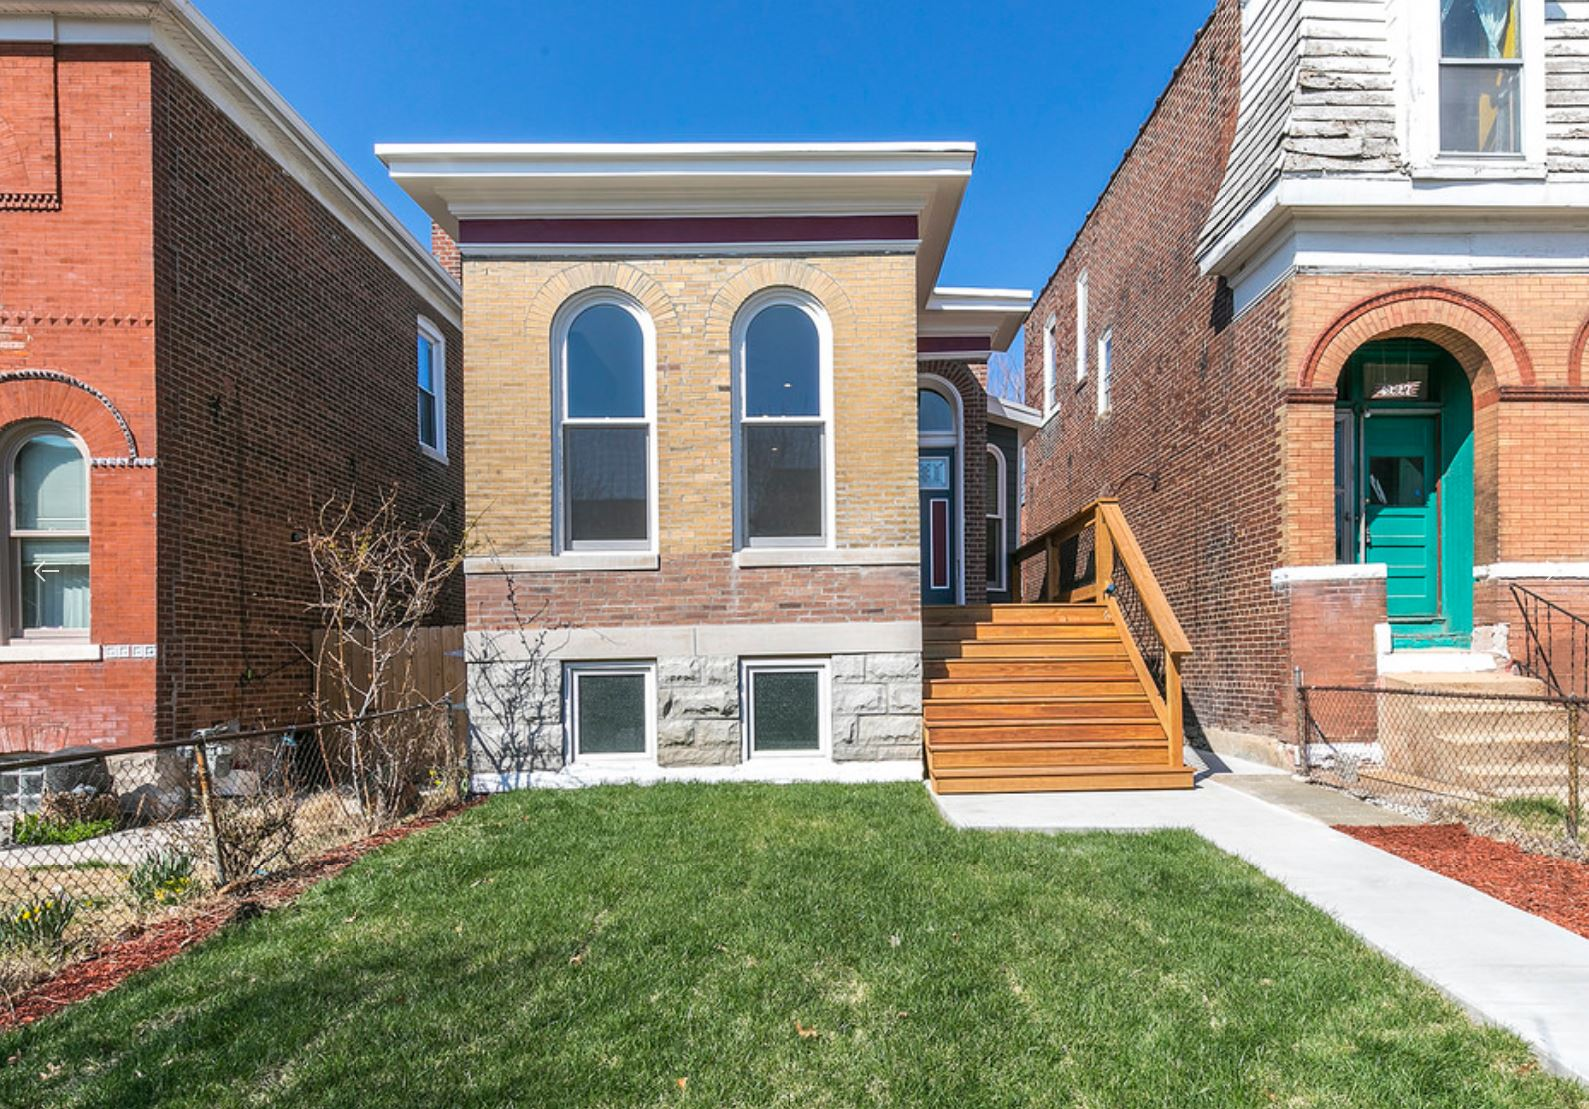 4229BlaineAvenue - St. Louis , MO 63110